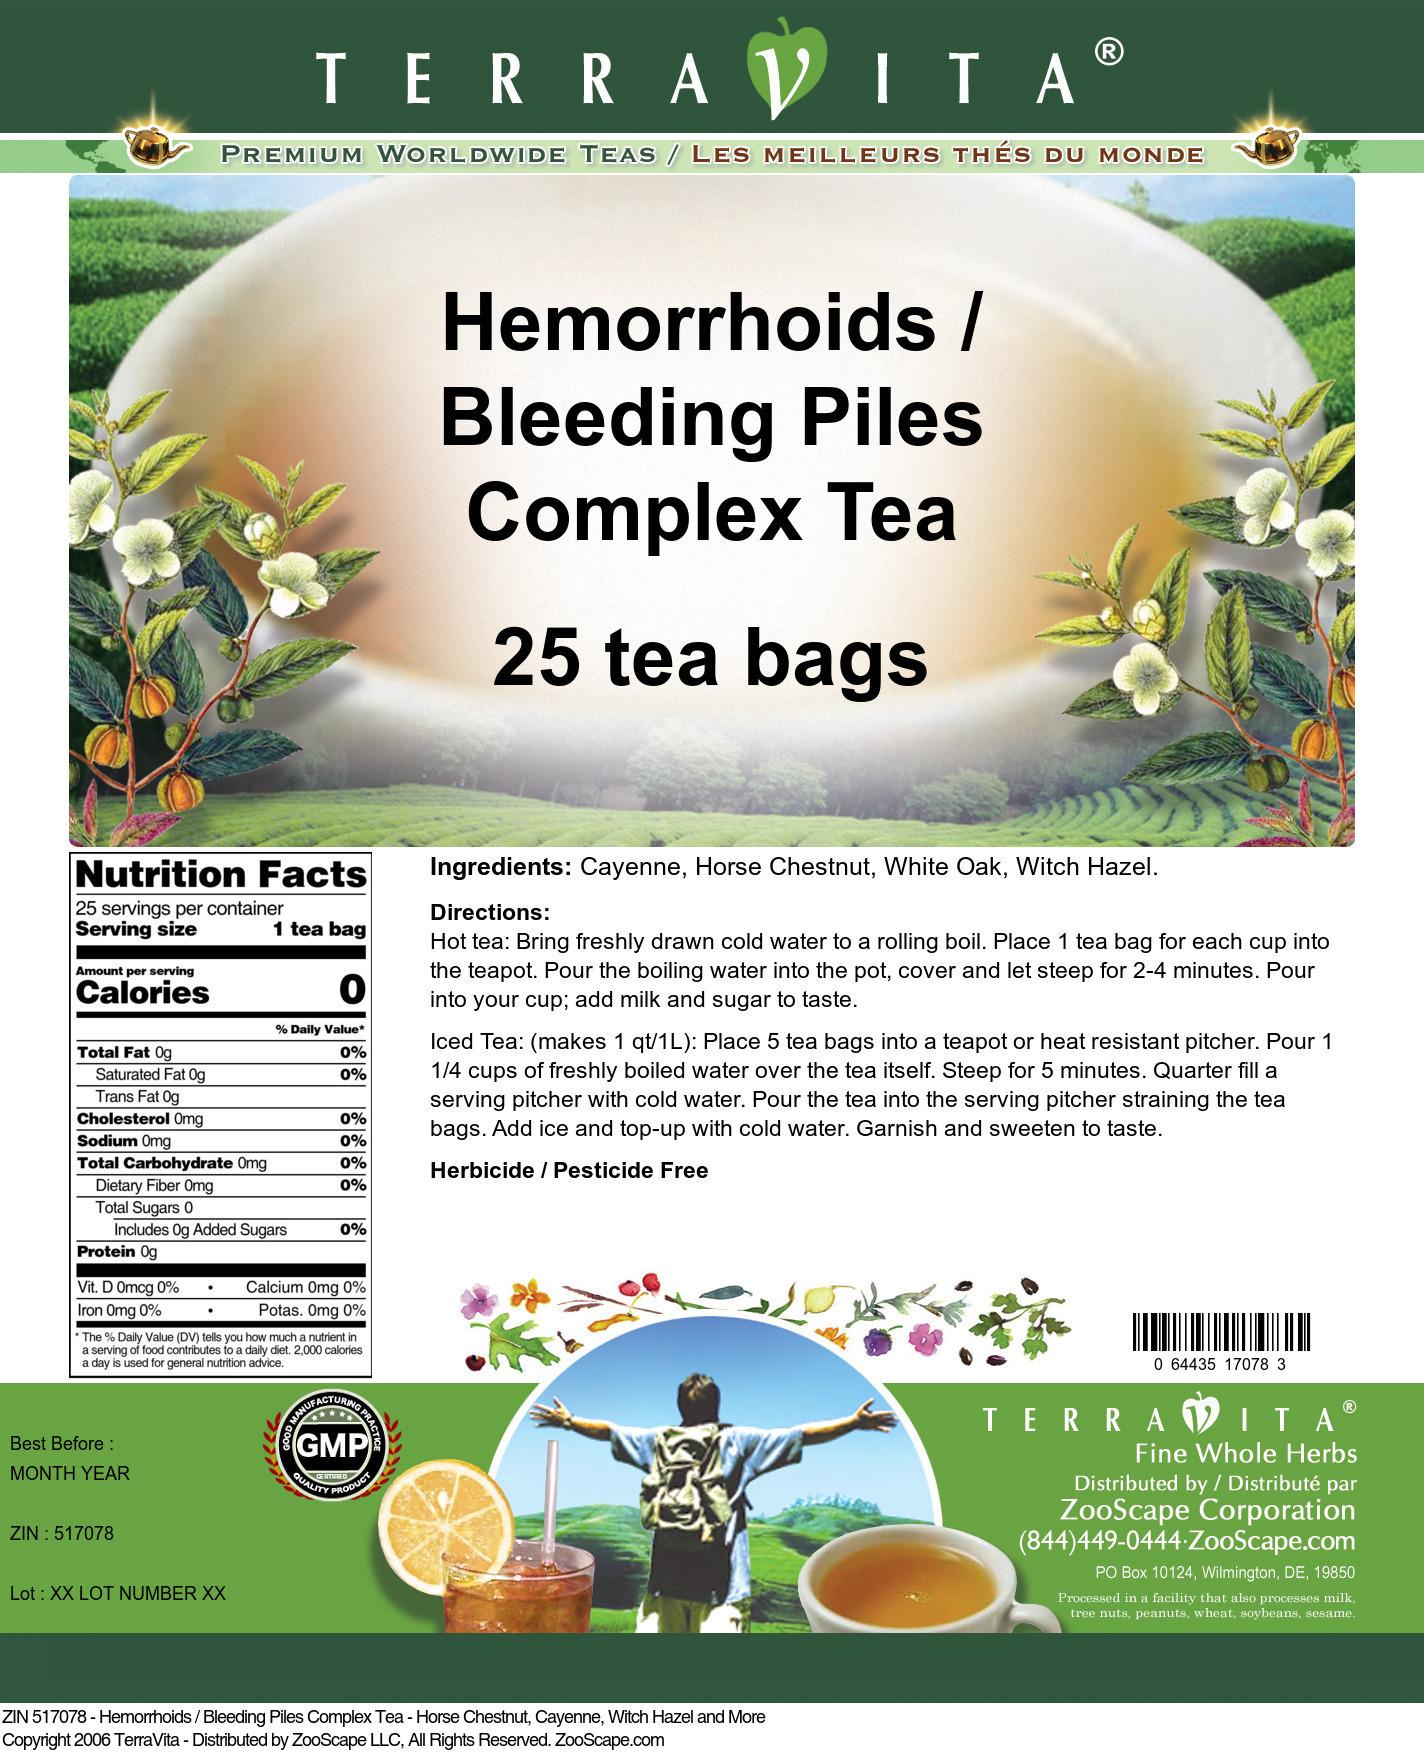 Hemorrhoids / Bleeding Piles Complex Tea - Horse Chestnut, Cayenne, Witch Hazel and More